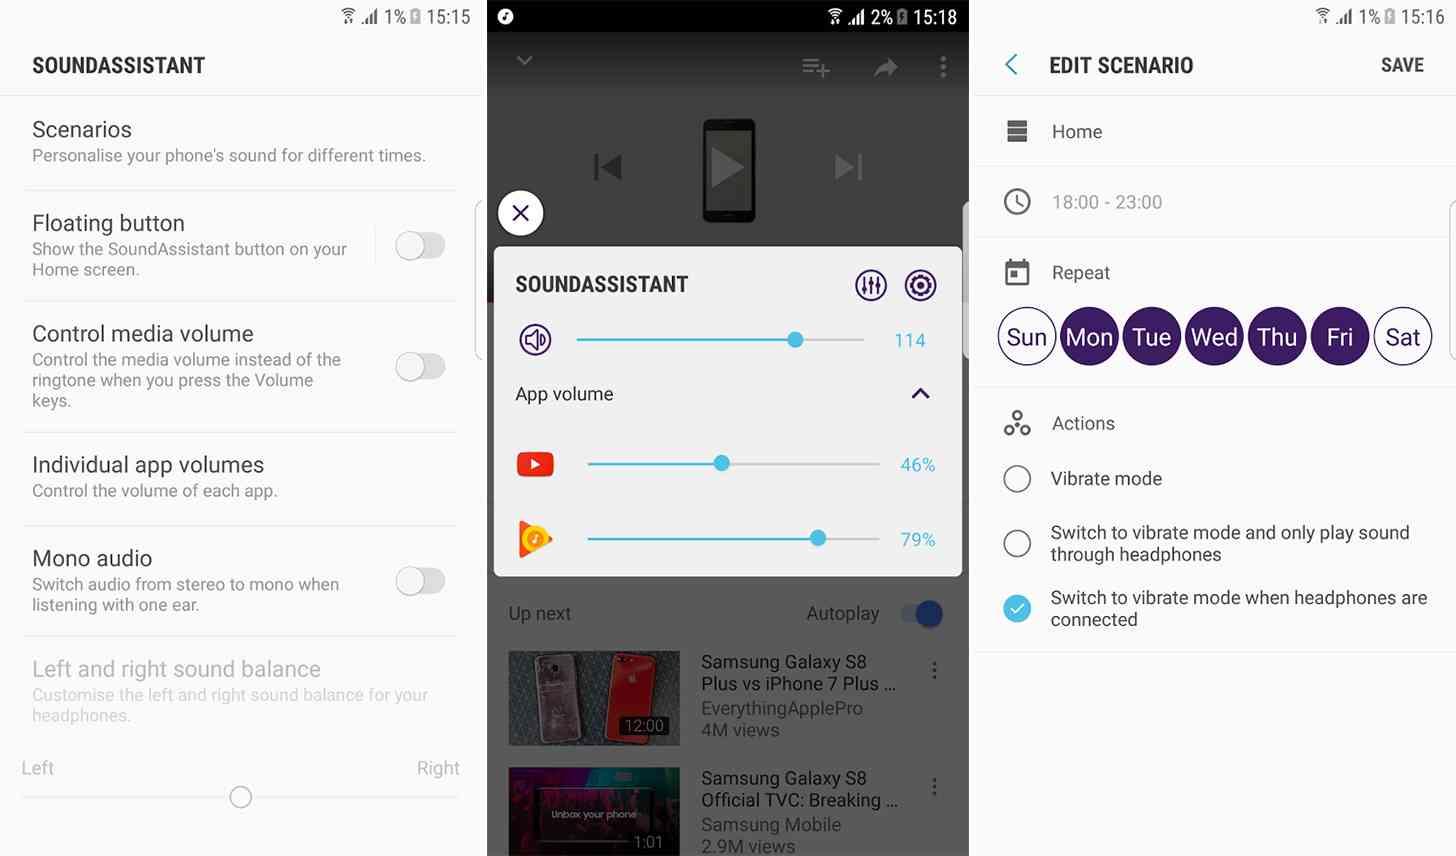 Samsung SoundAssistant app features